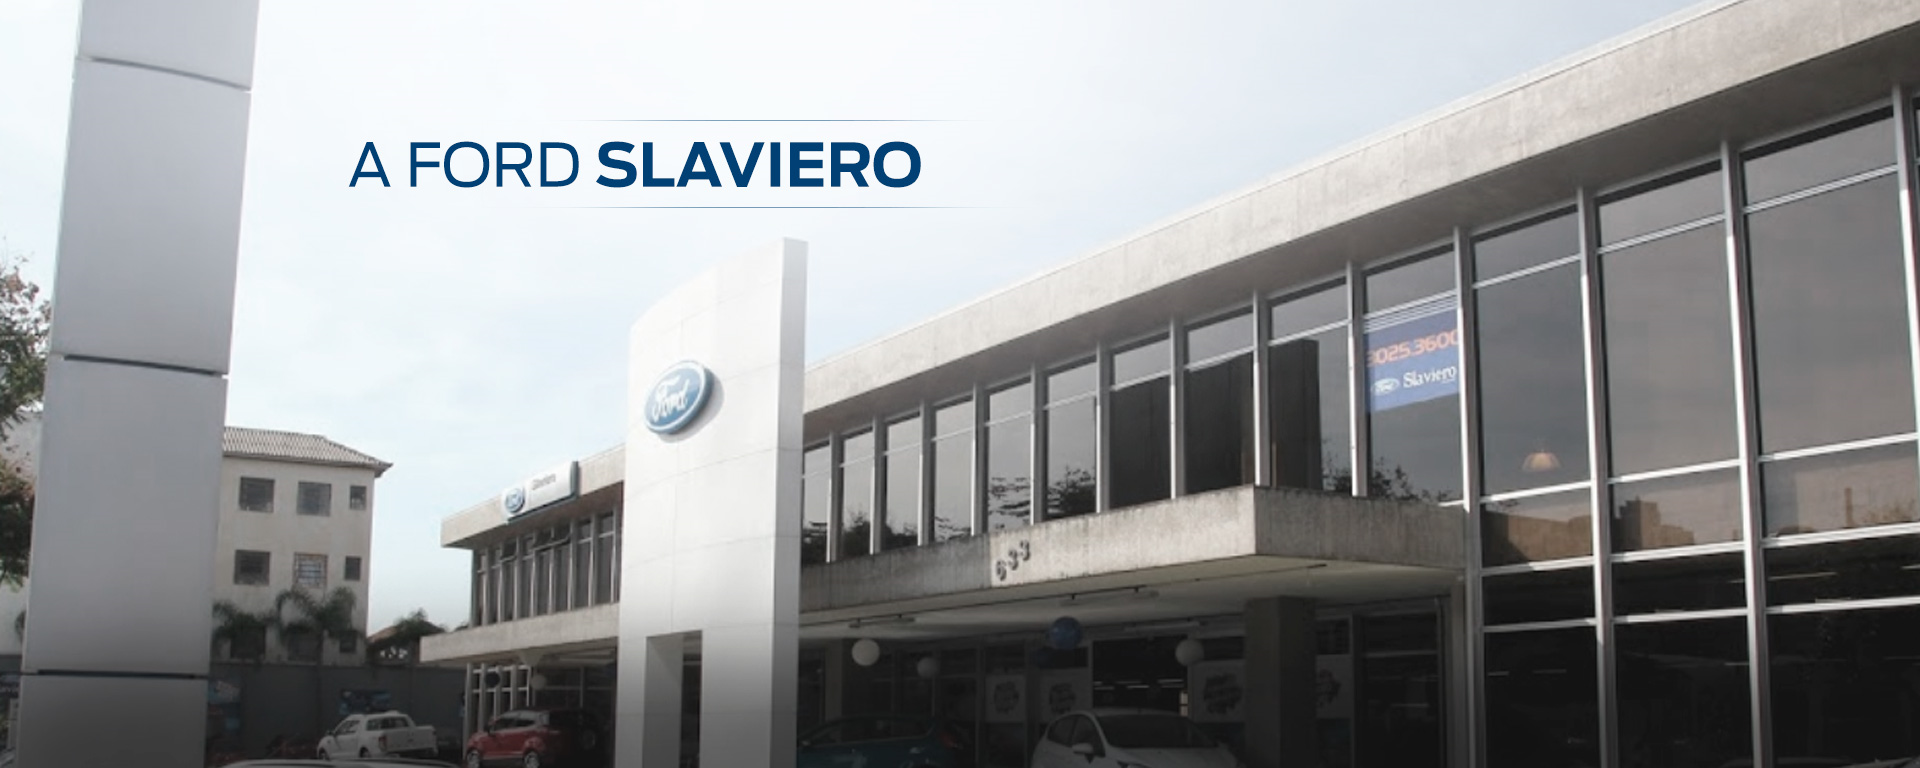 A Ford Slaviero Institucional